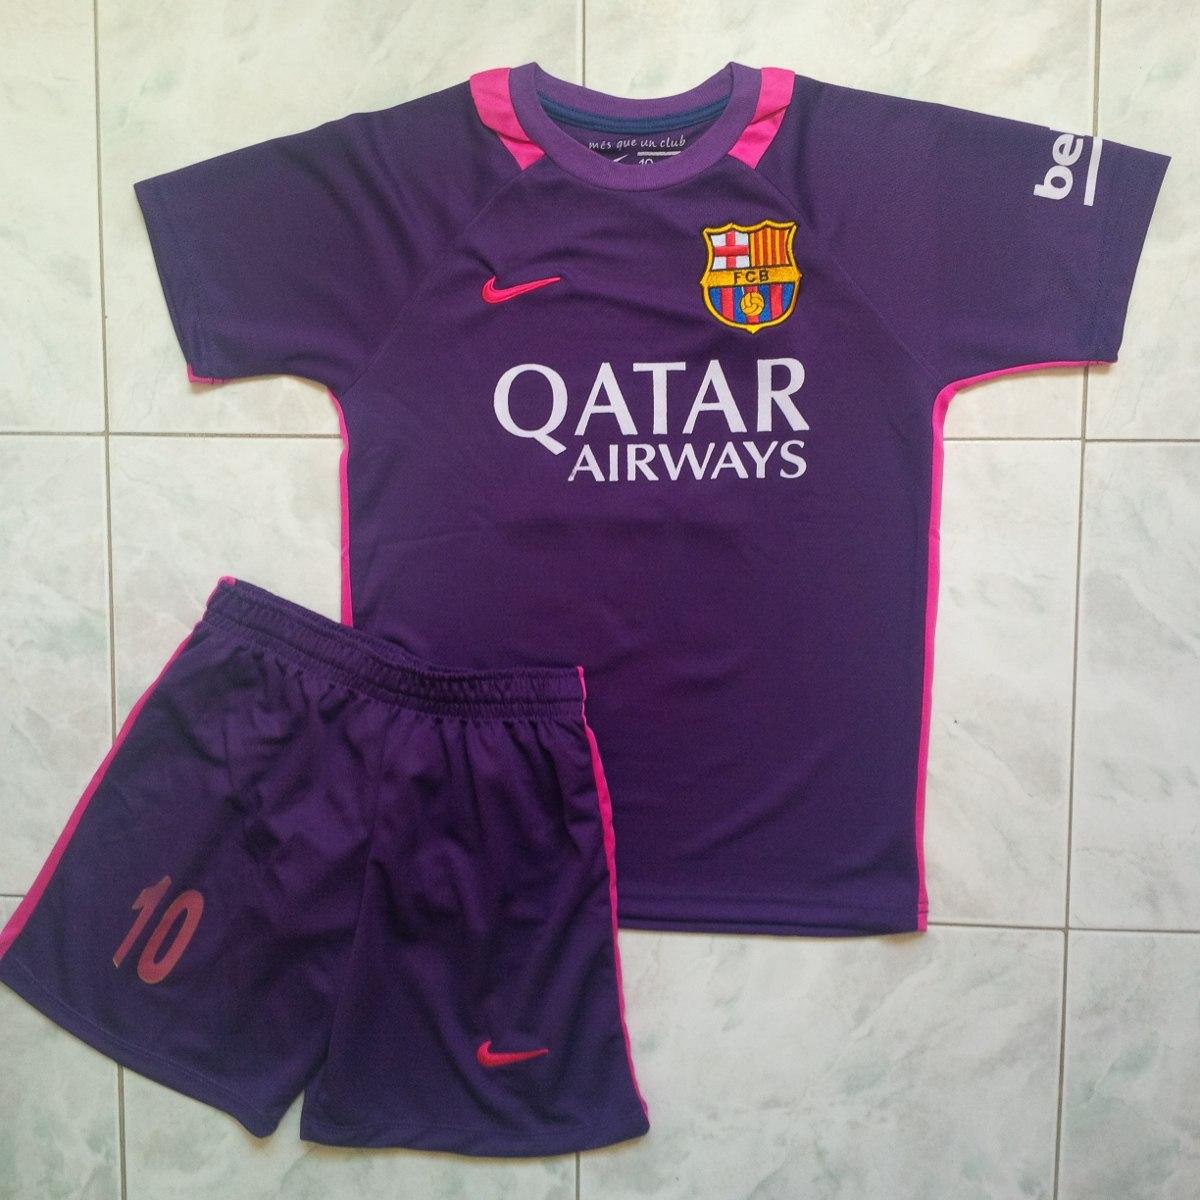 da2f79d714c75 uniformes barcelona purpura 2017 niños messi suarez neymar. Cargando zoom.